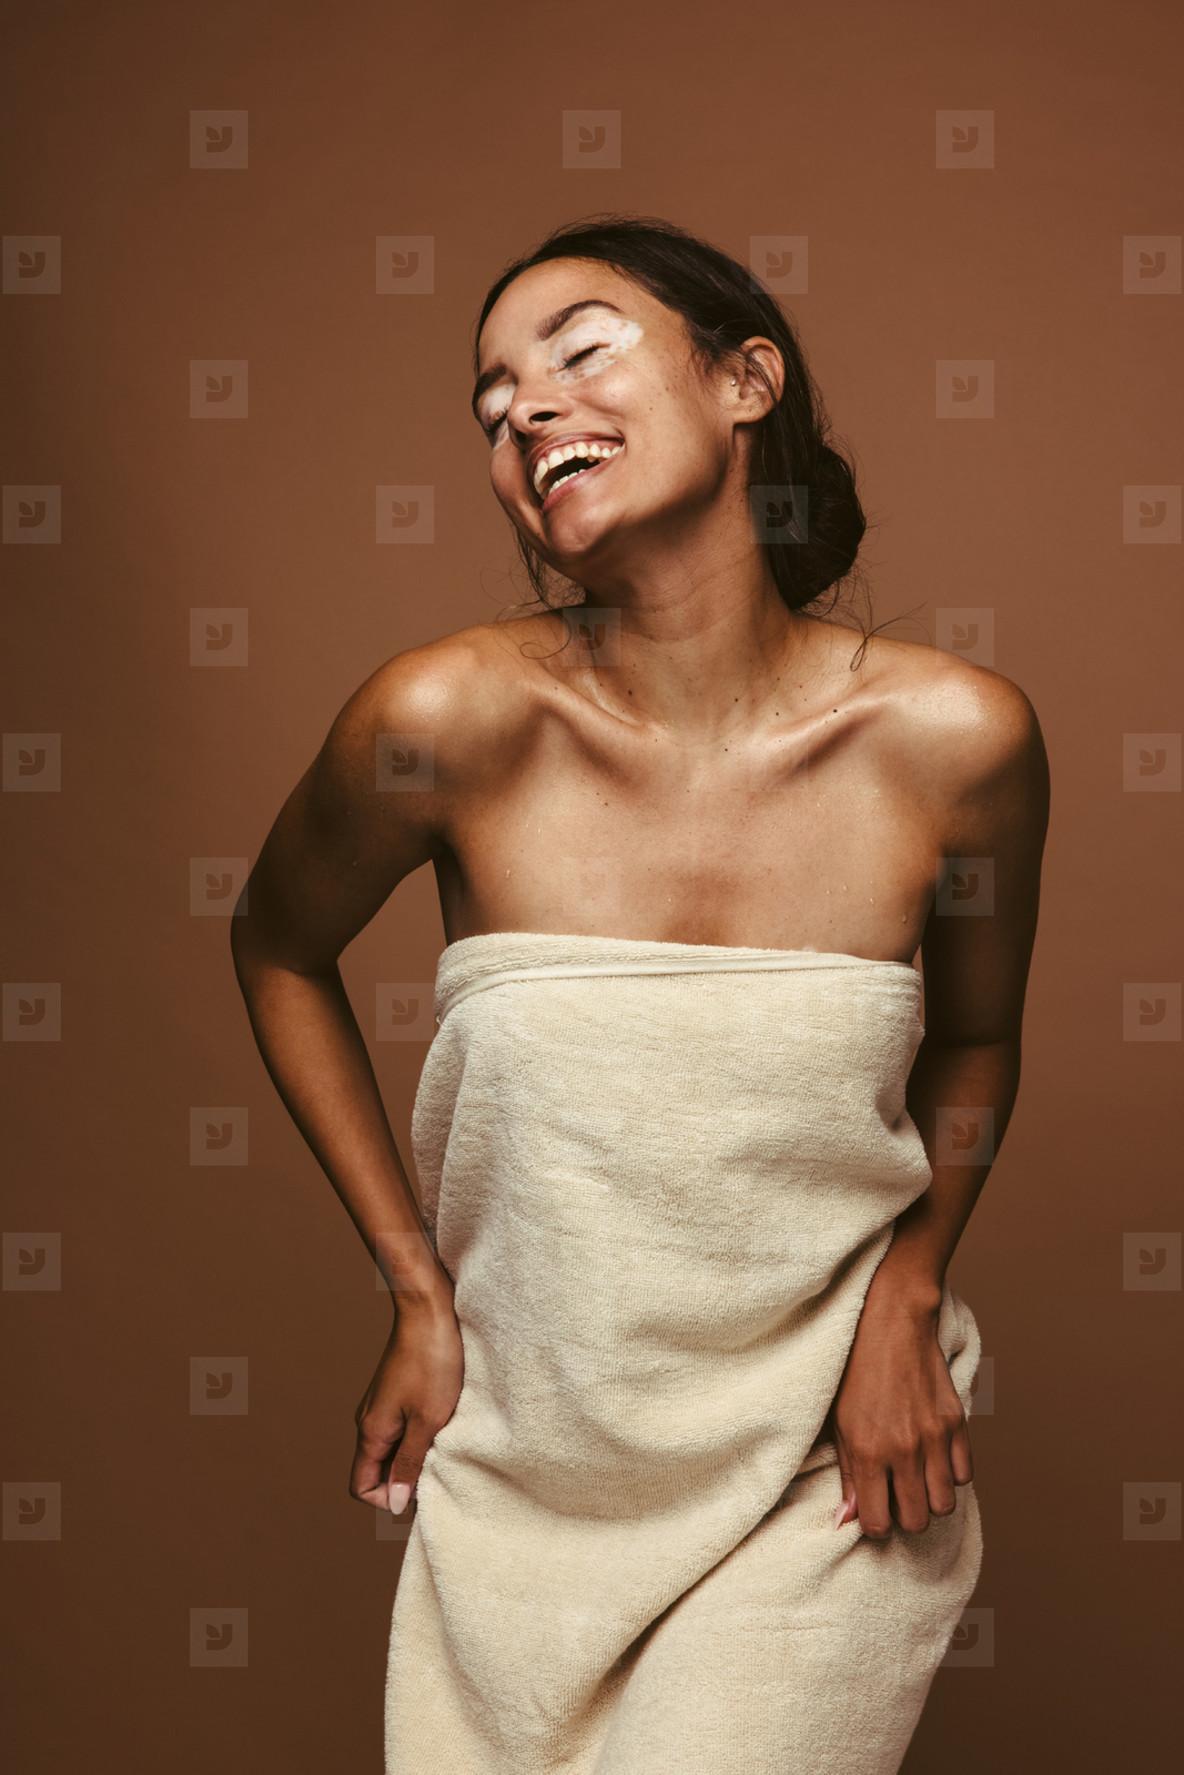 Cheerful woman dancing in bath towel